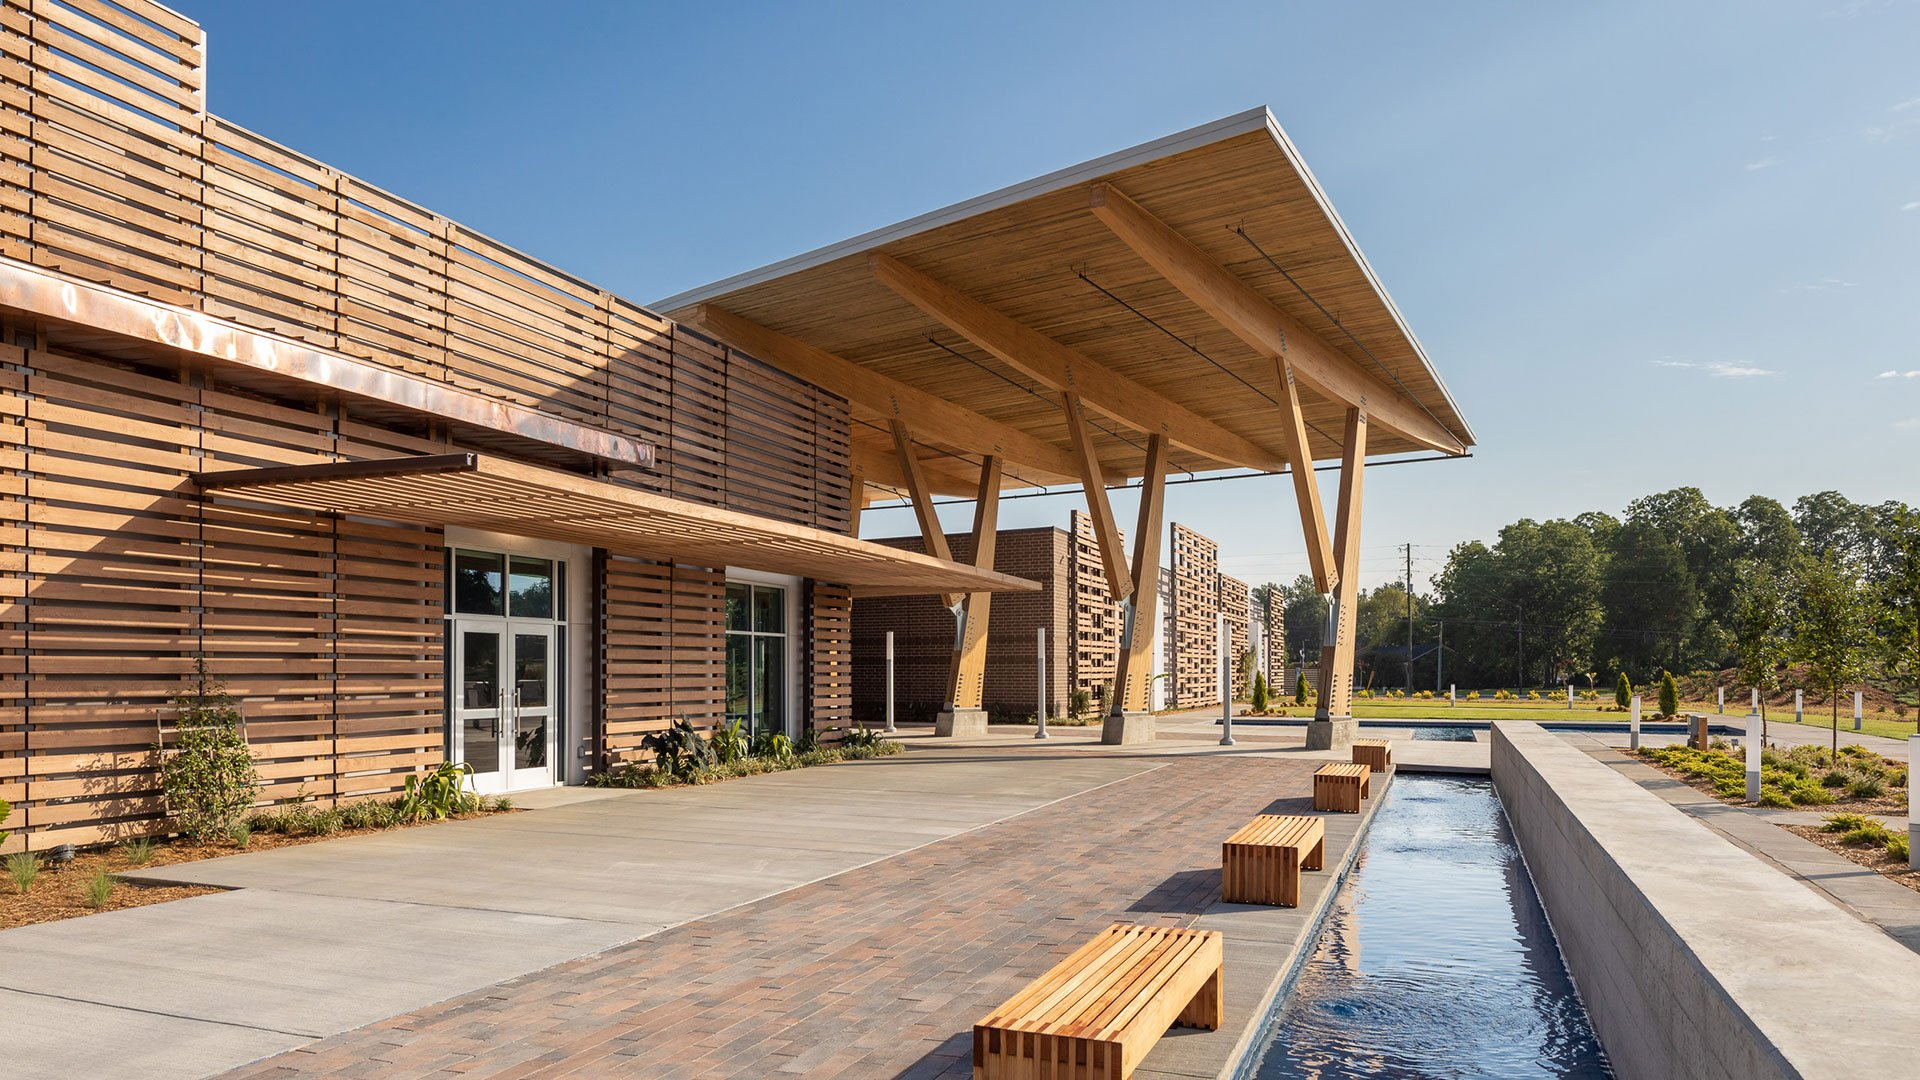 Florence-Darlington Tech, The Continuum, Lake City Campus